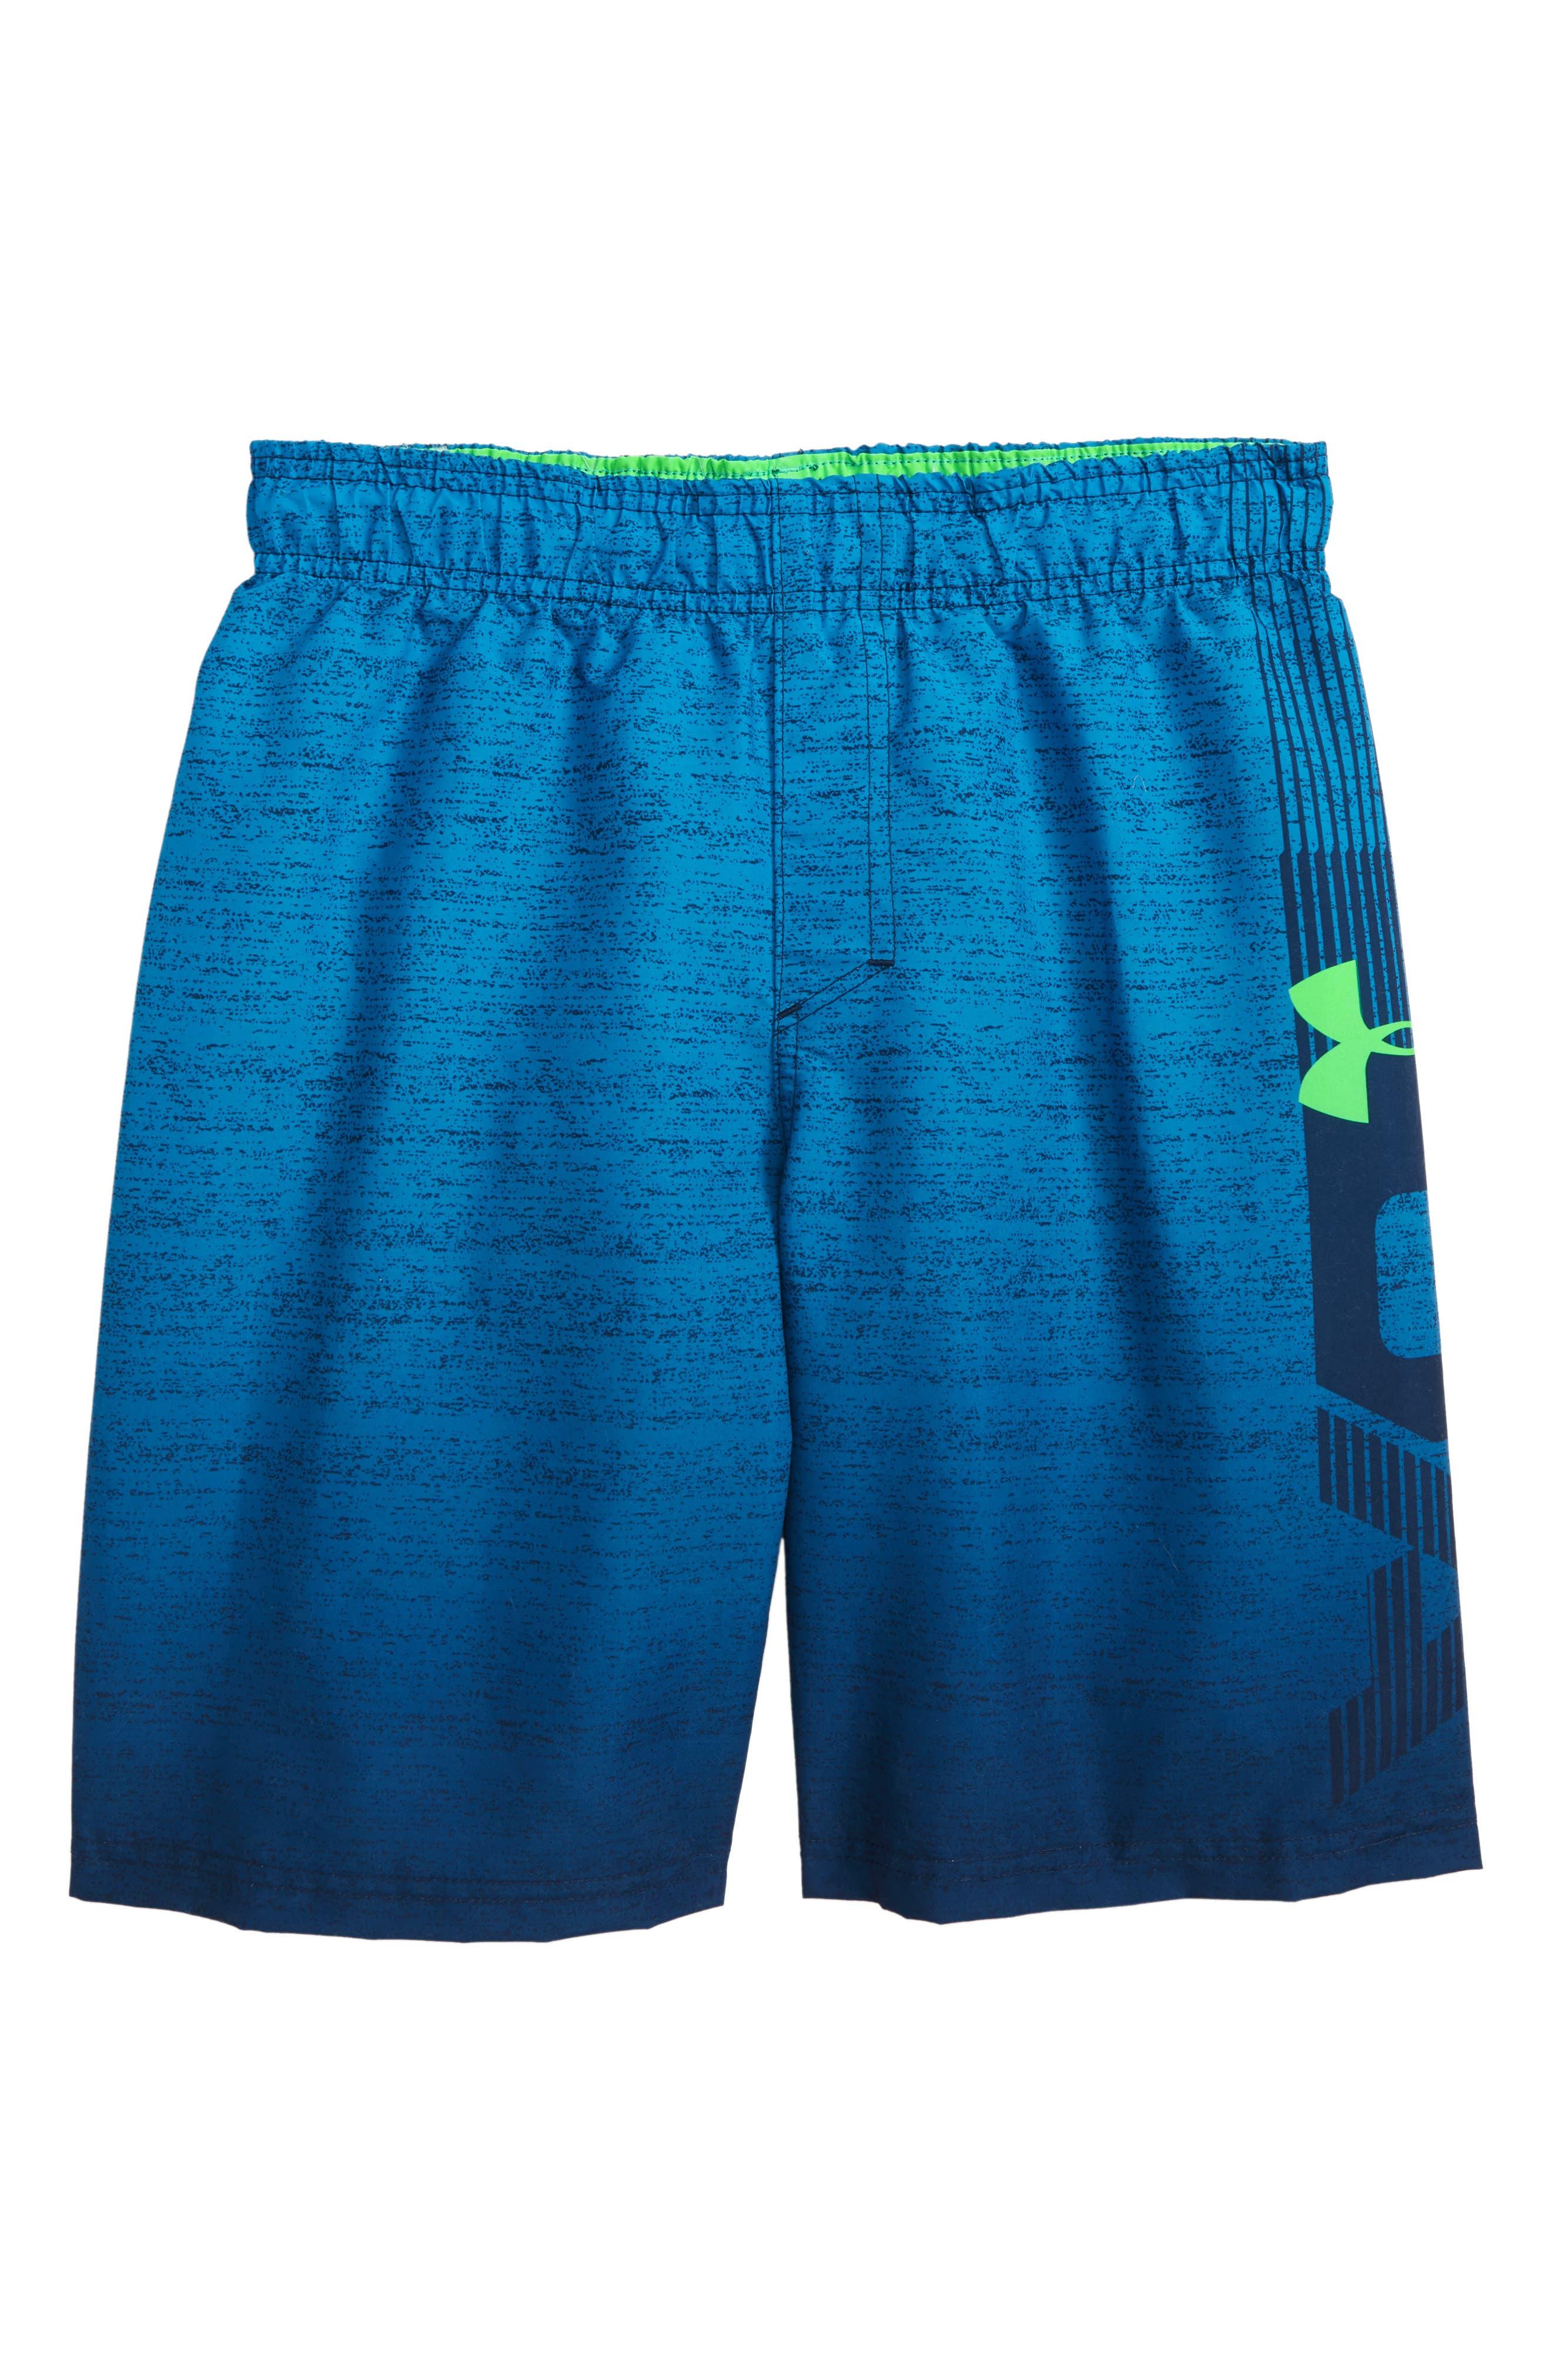 Under Armour Dipper HeatGear® Volley Shorts (Big Boys)